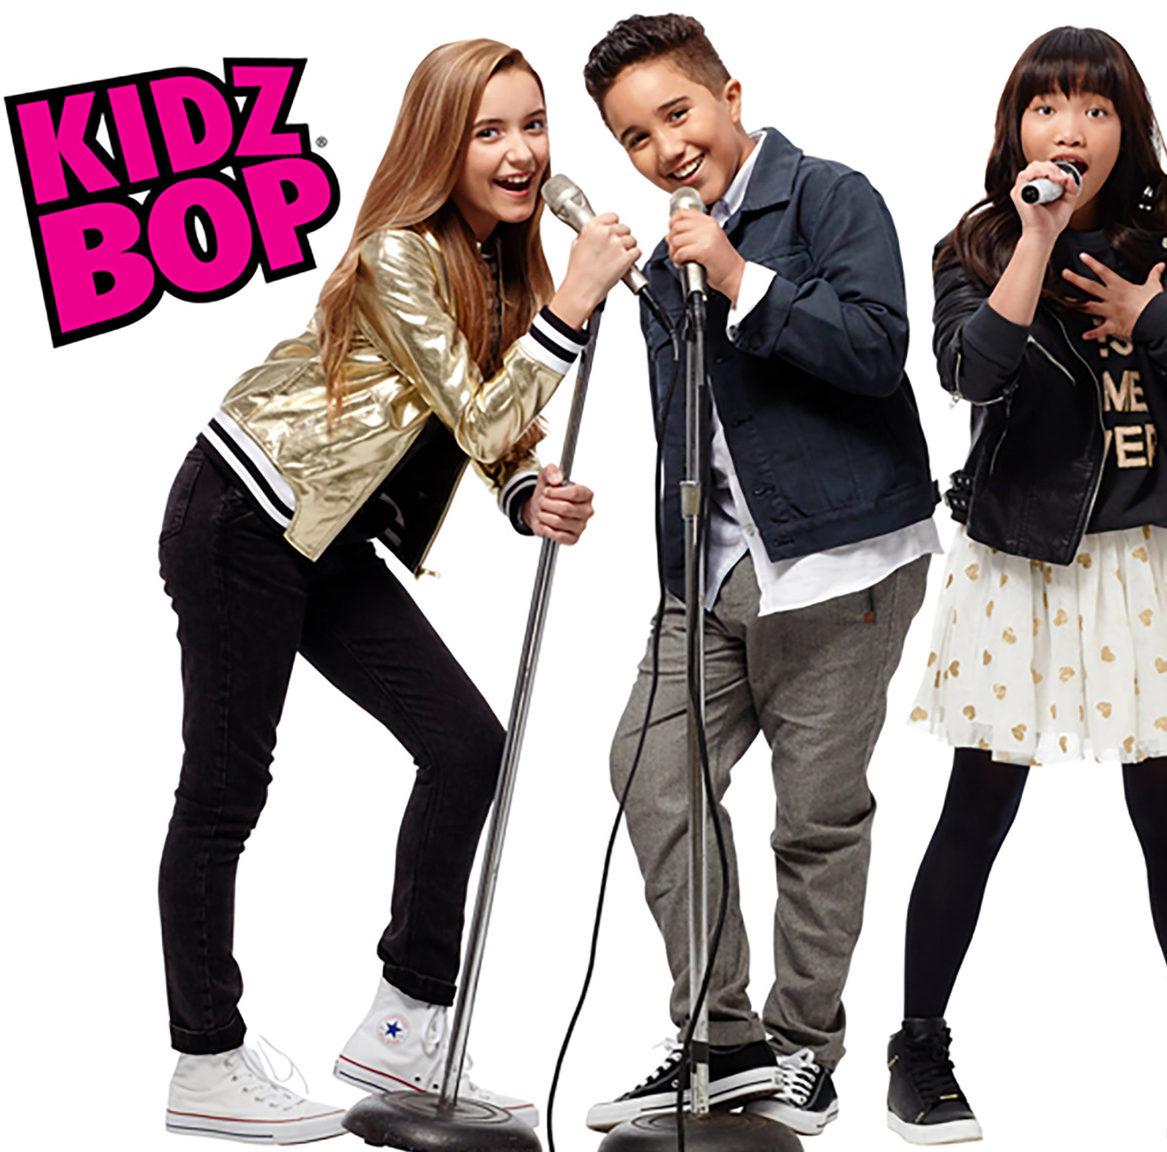 Kidz Bop Best Time Ever Tour Reviews